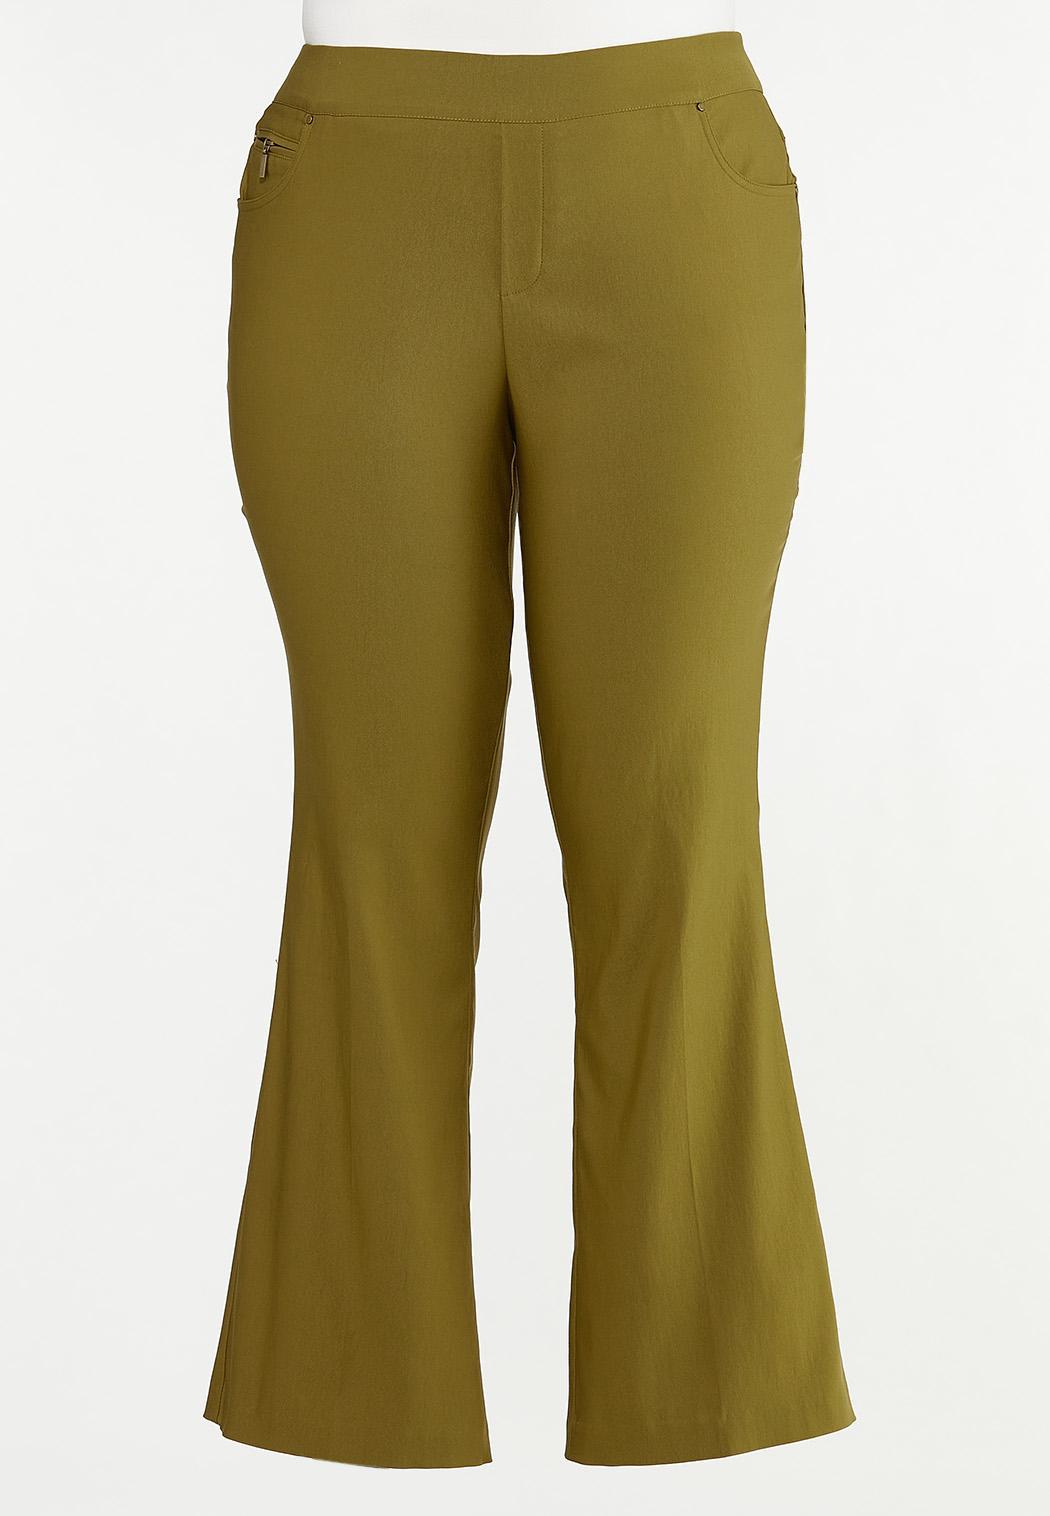 Plus Size Solid Bengaline Flare Pants